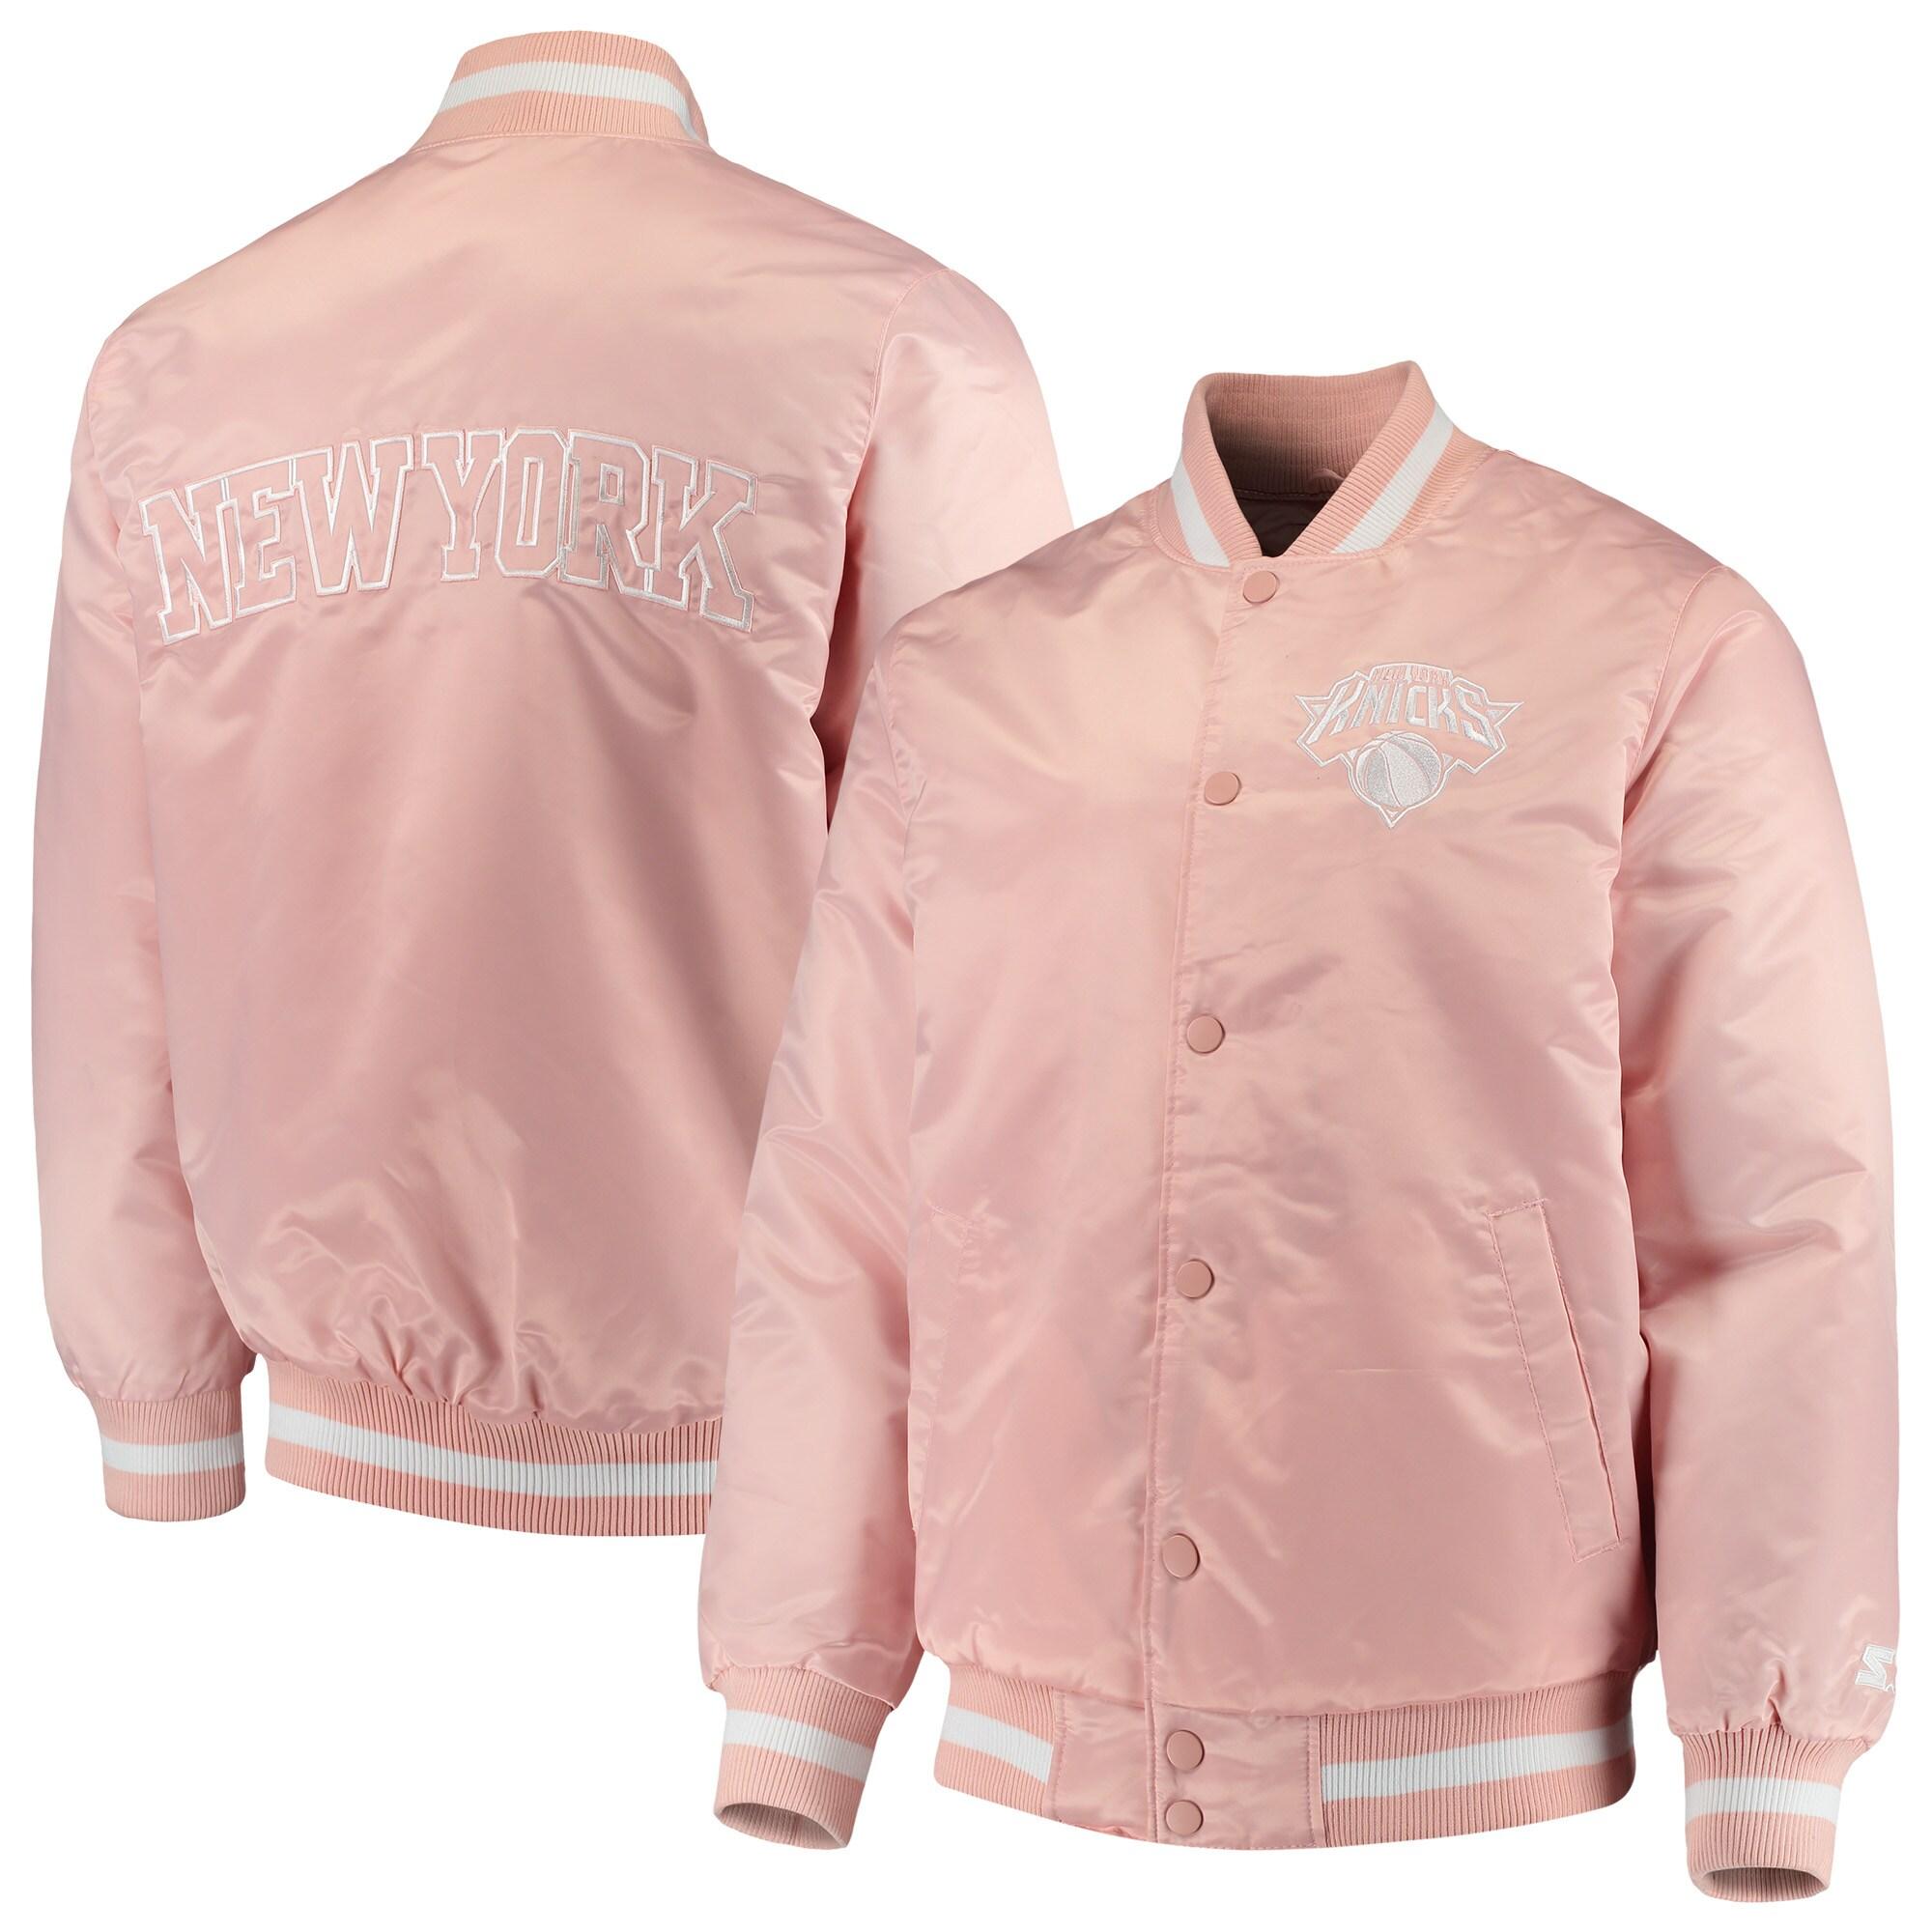 New York Knicks Starter Satin Full-Snap Jacket - Pink